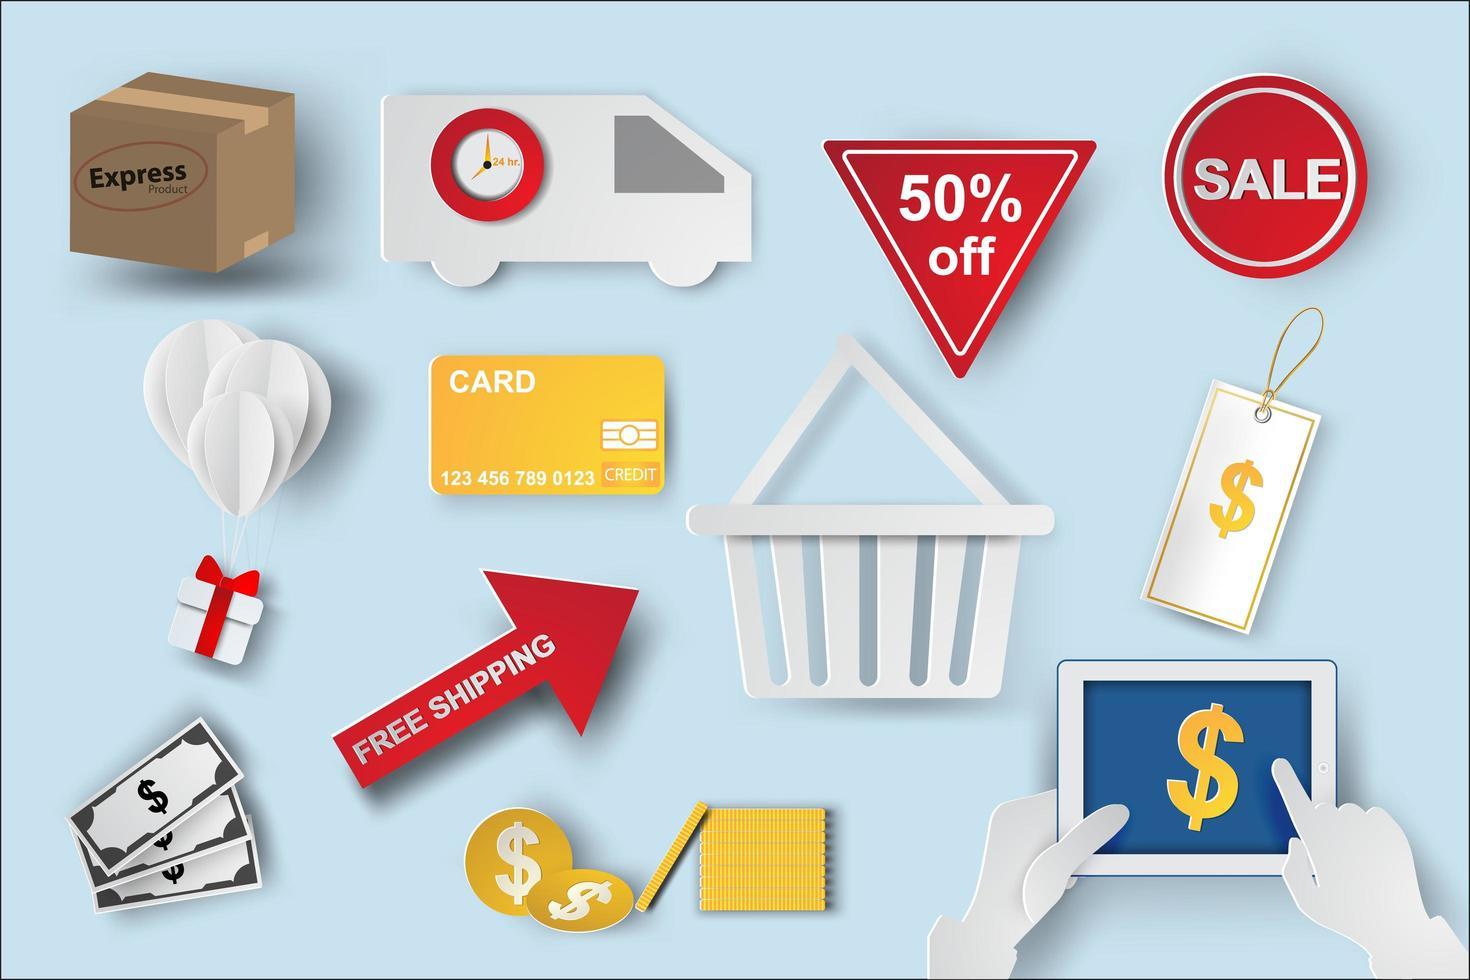 papier kunst e-commerce pictogrammen instellen vector